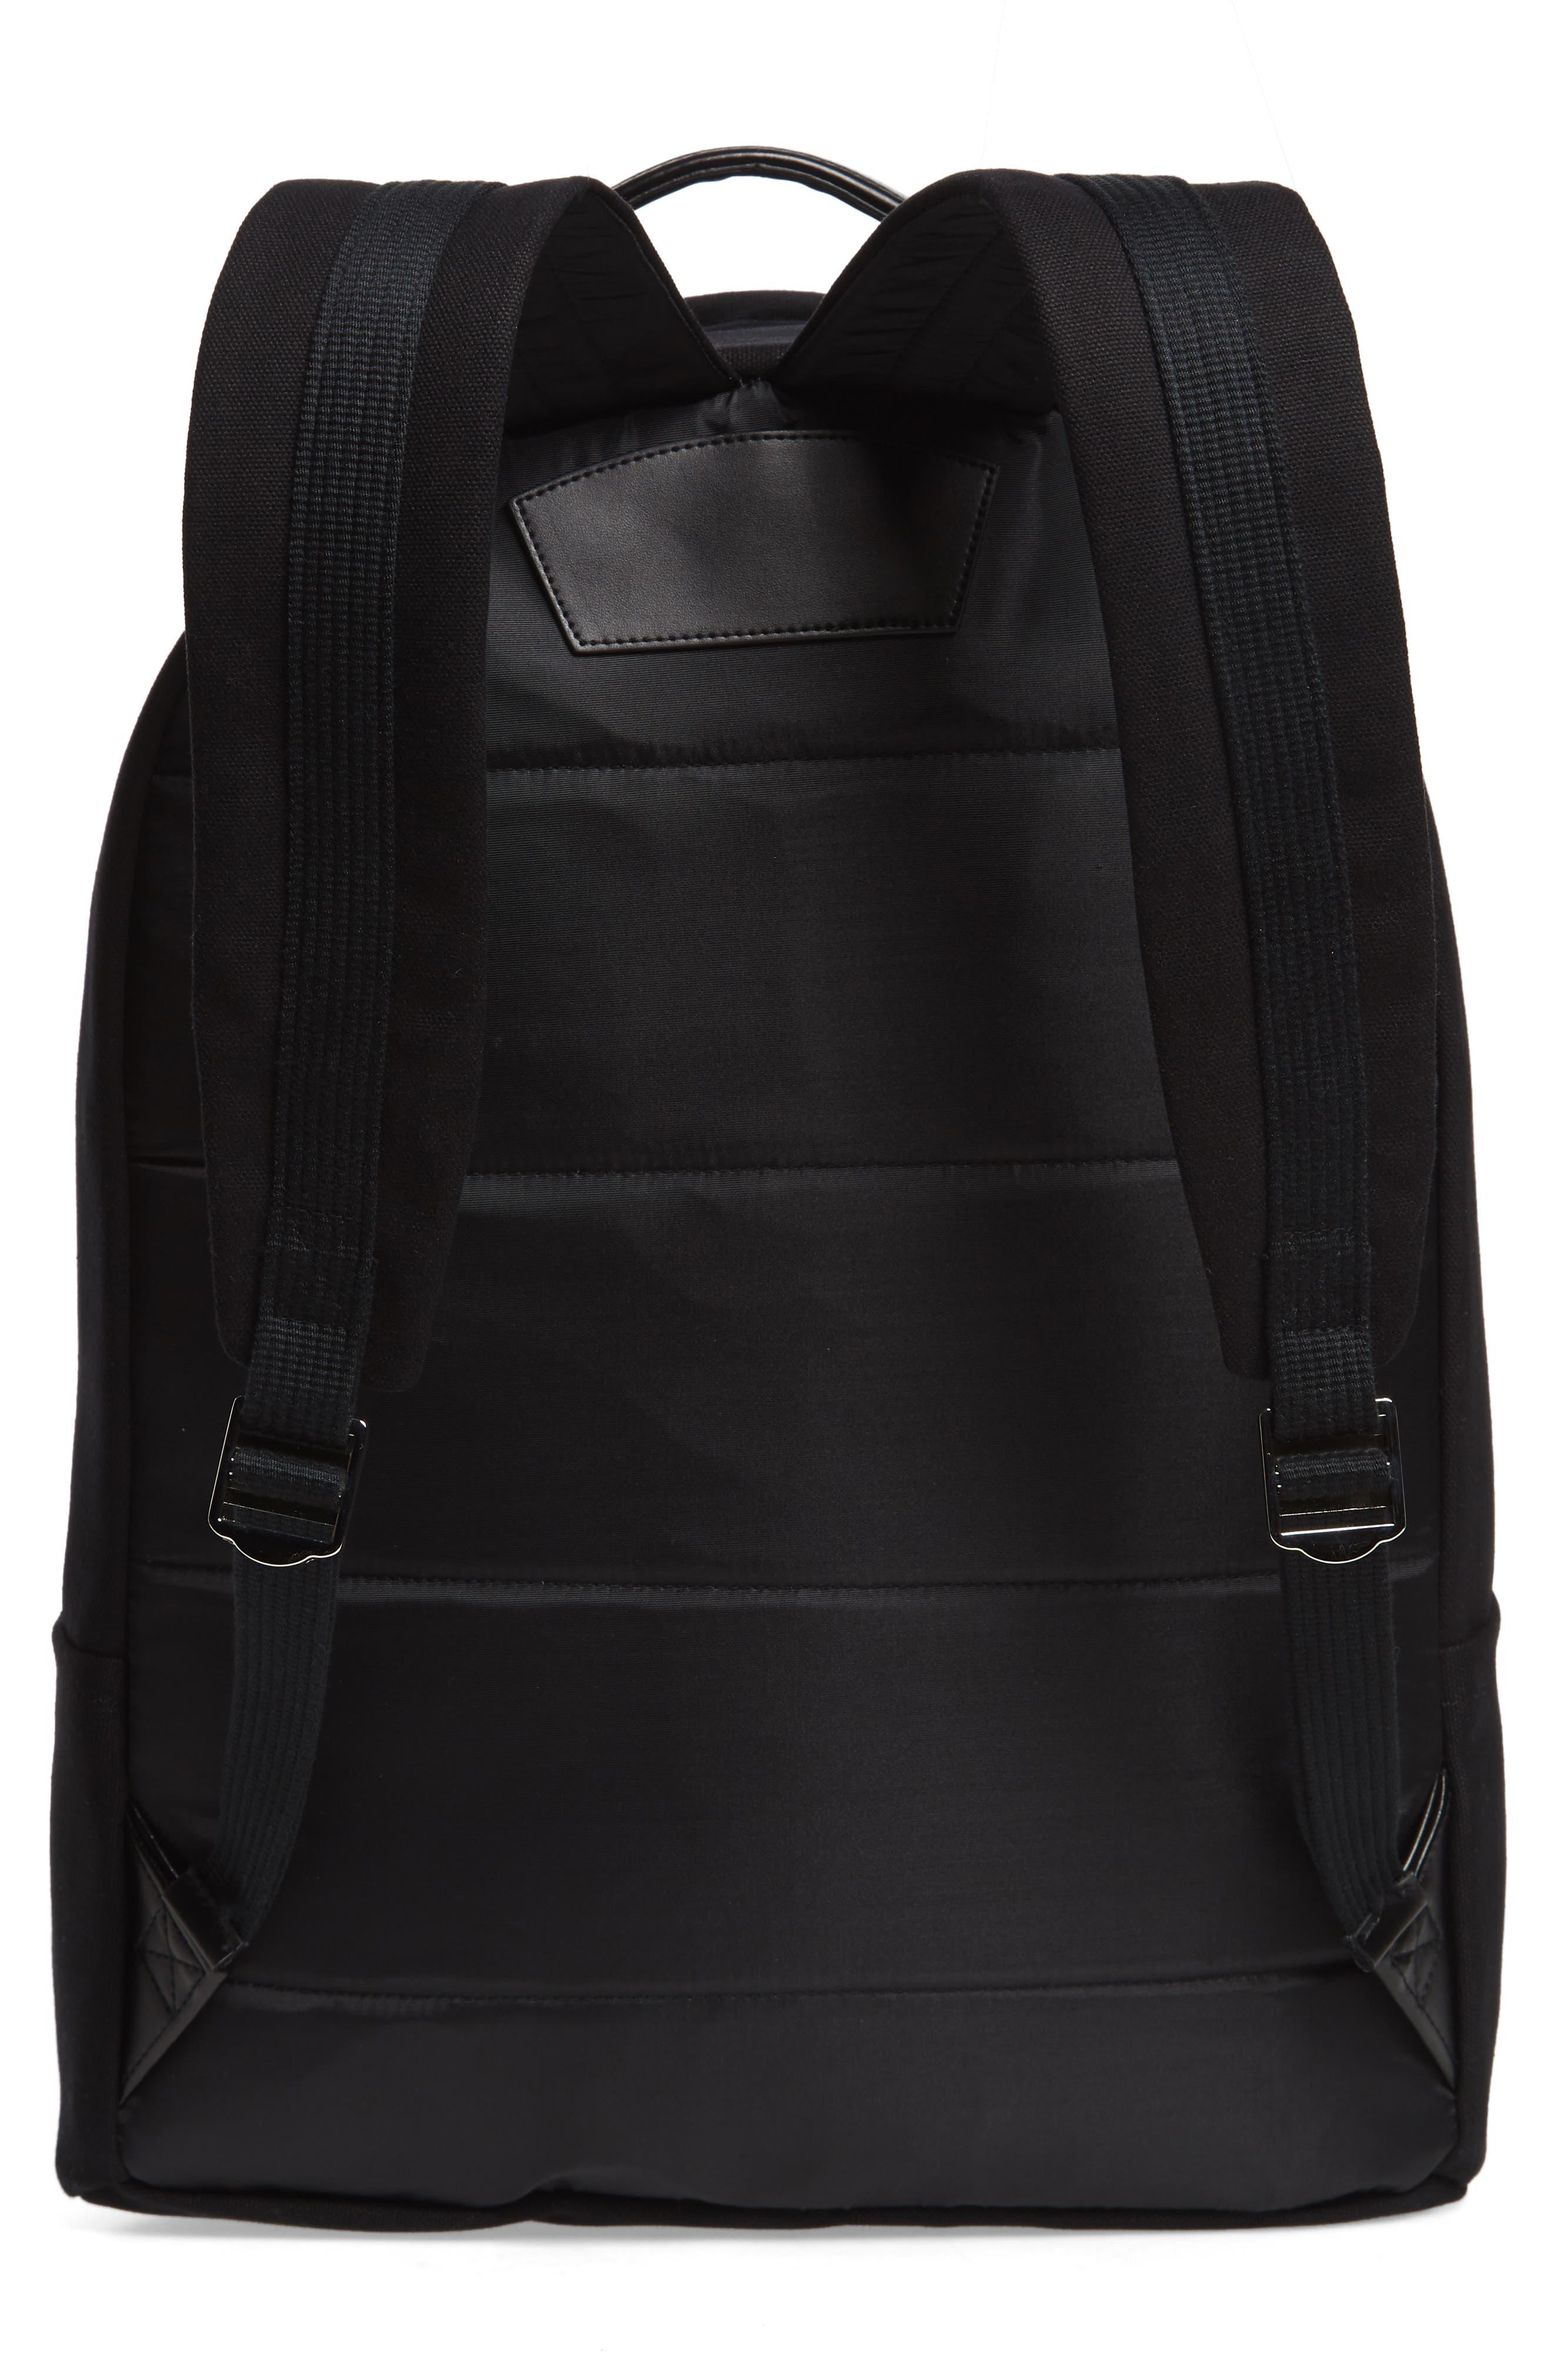 Hannes Water Repellent Backpack,                             Alternate thumbnail 3, color,                             BLACK